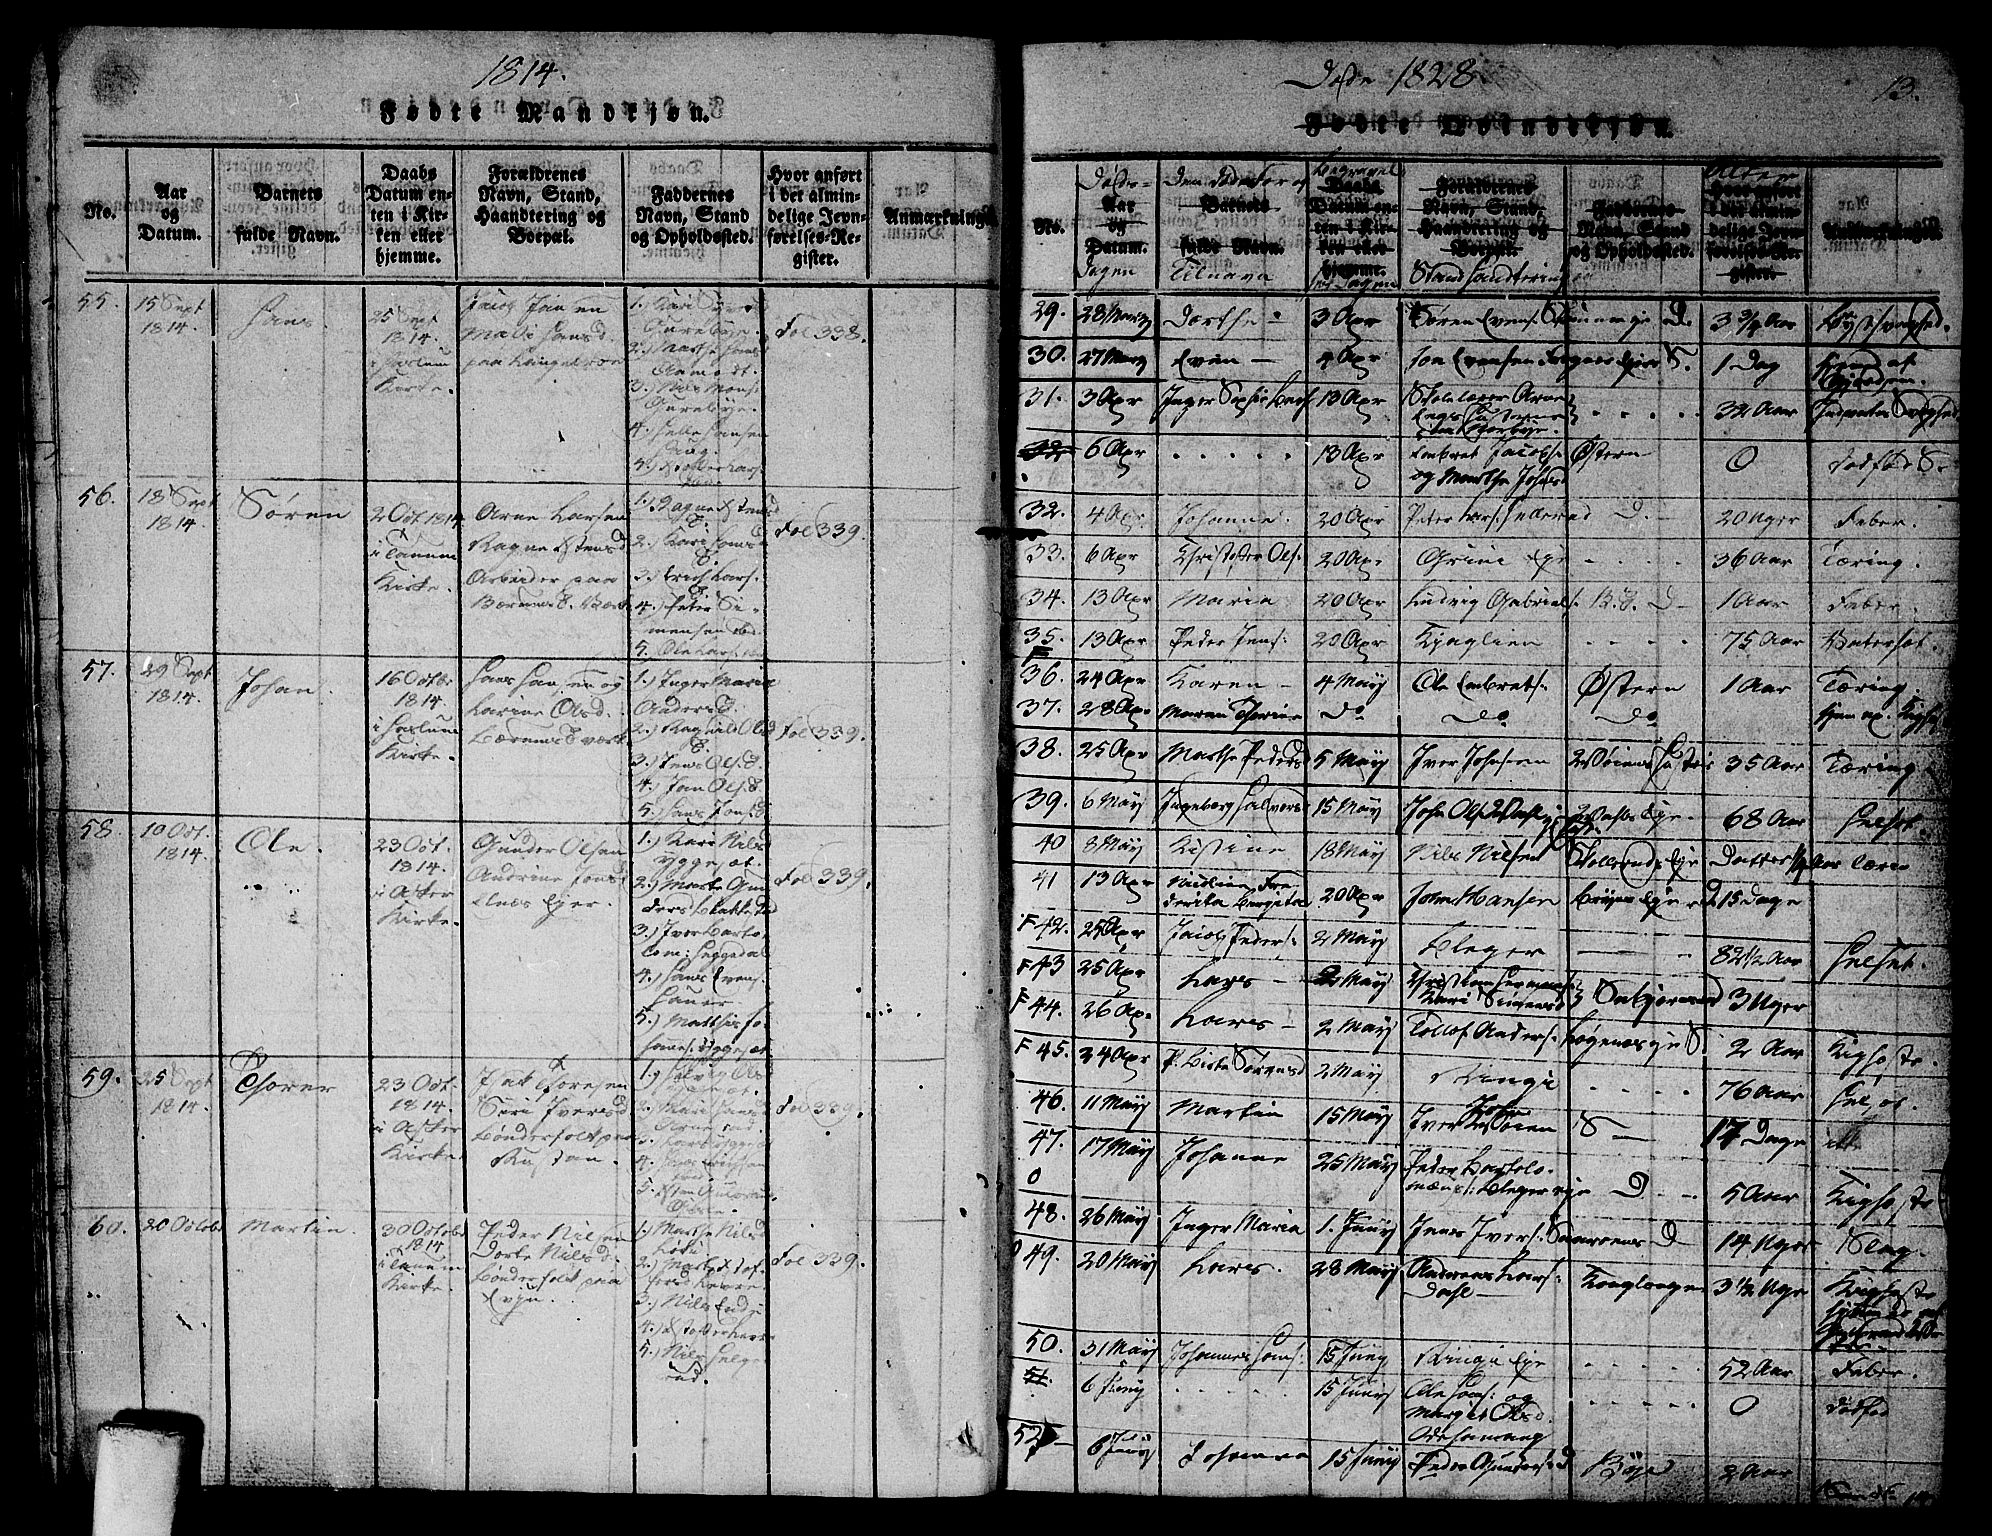 SAO, Asker prestekontor Kirkebøker, G/Ga/L0001: Klokkerbok nr. I 1, 1814-1830, s. 13